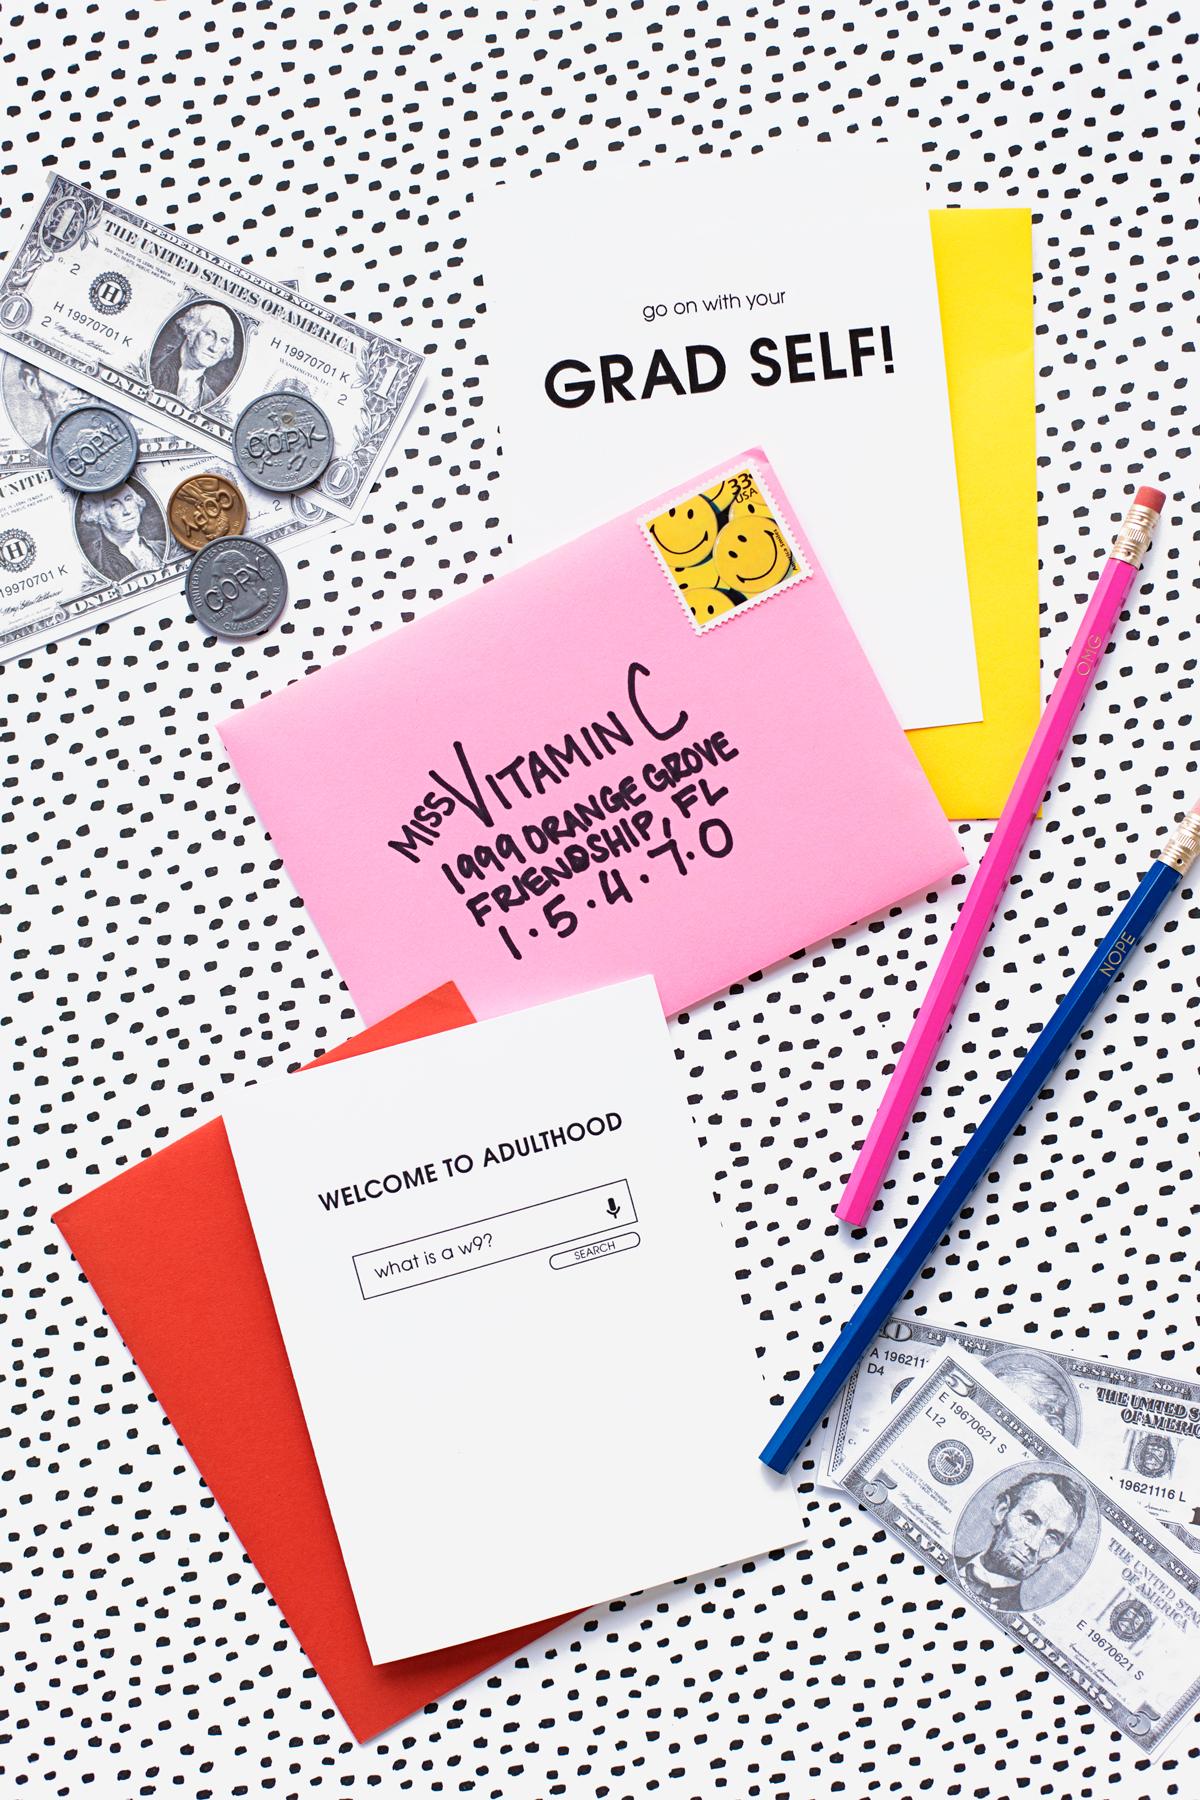 welcome to adulthood  free printable graduation cards